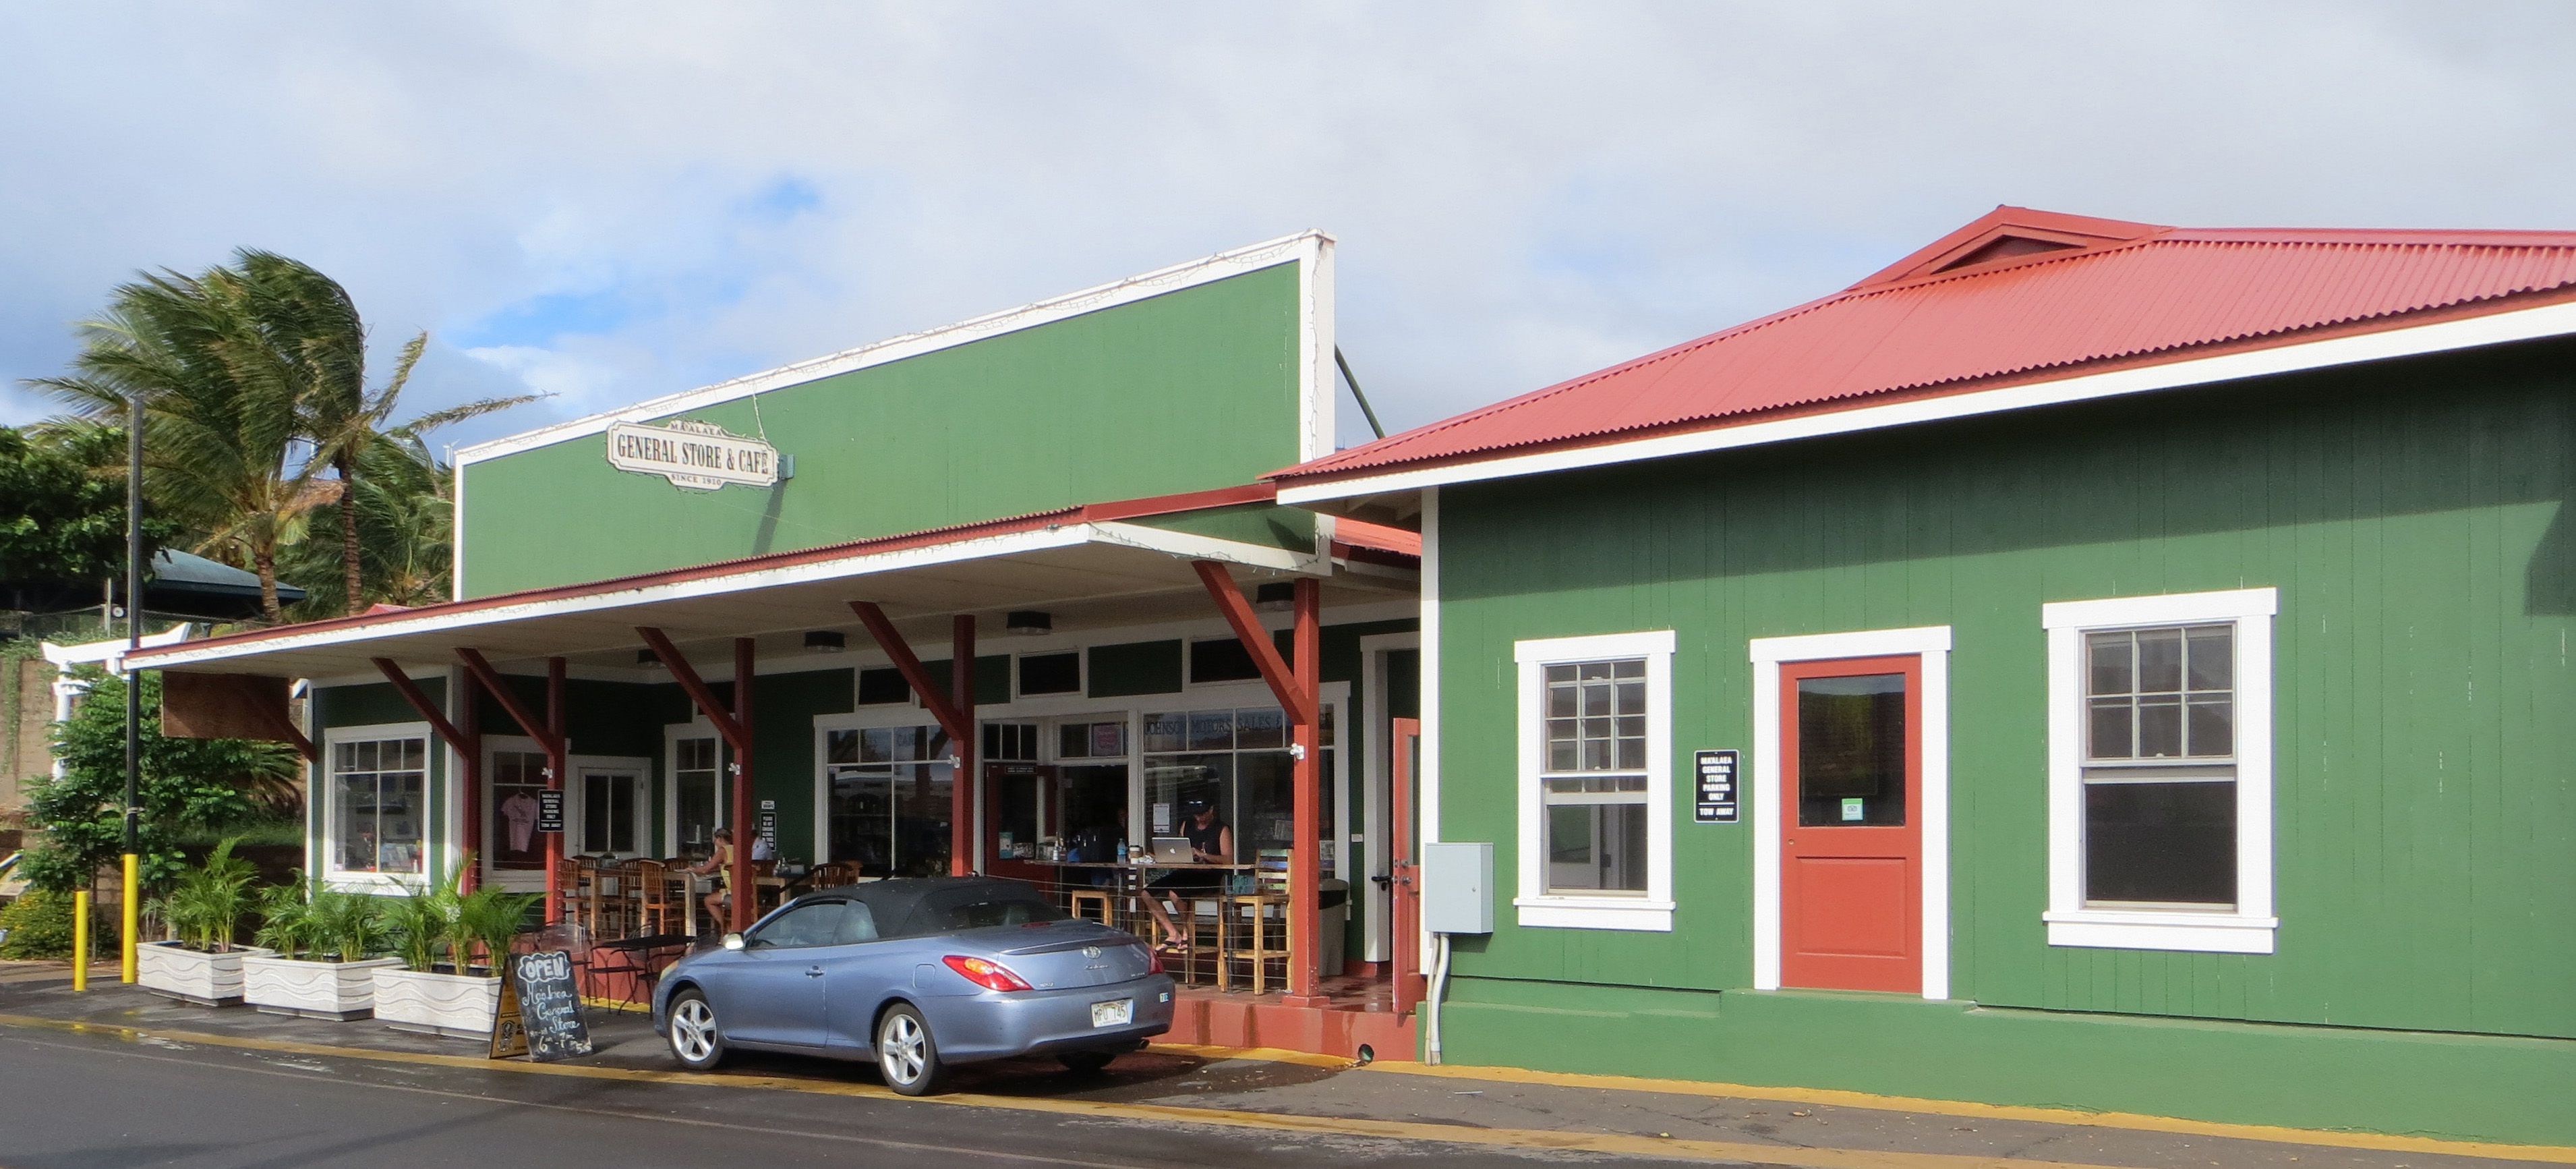 Maalaea General Store. Photo source: wikimedia.org/wikipedia/commons/e/ed/Maui-Maalaea-GeneralStore-front.